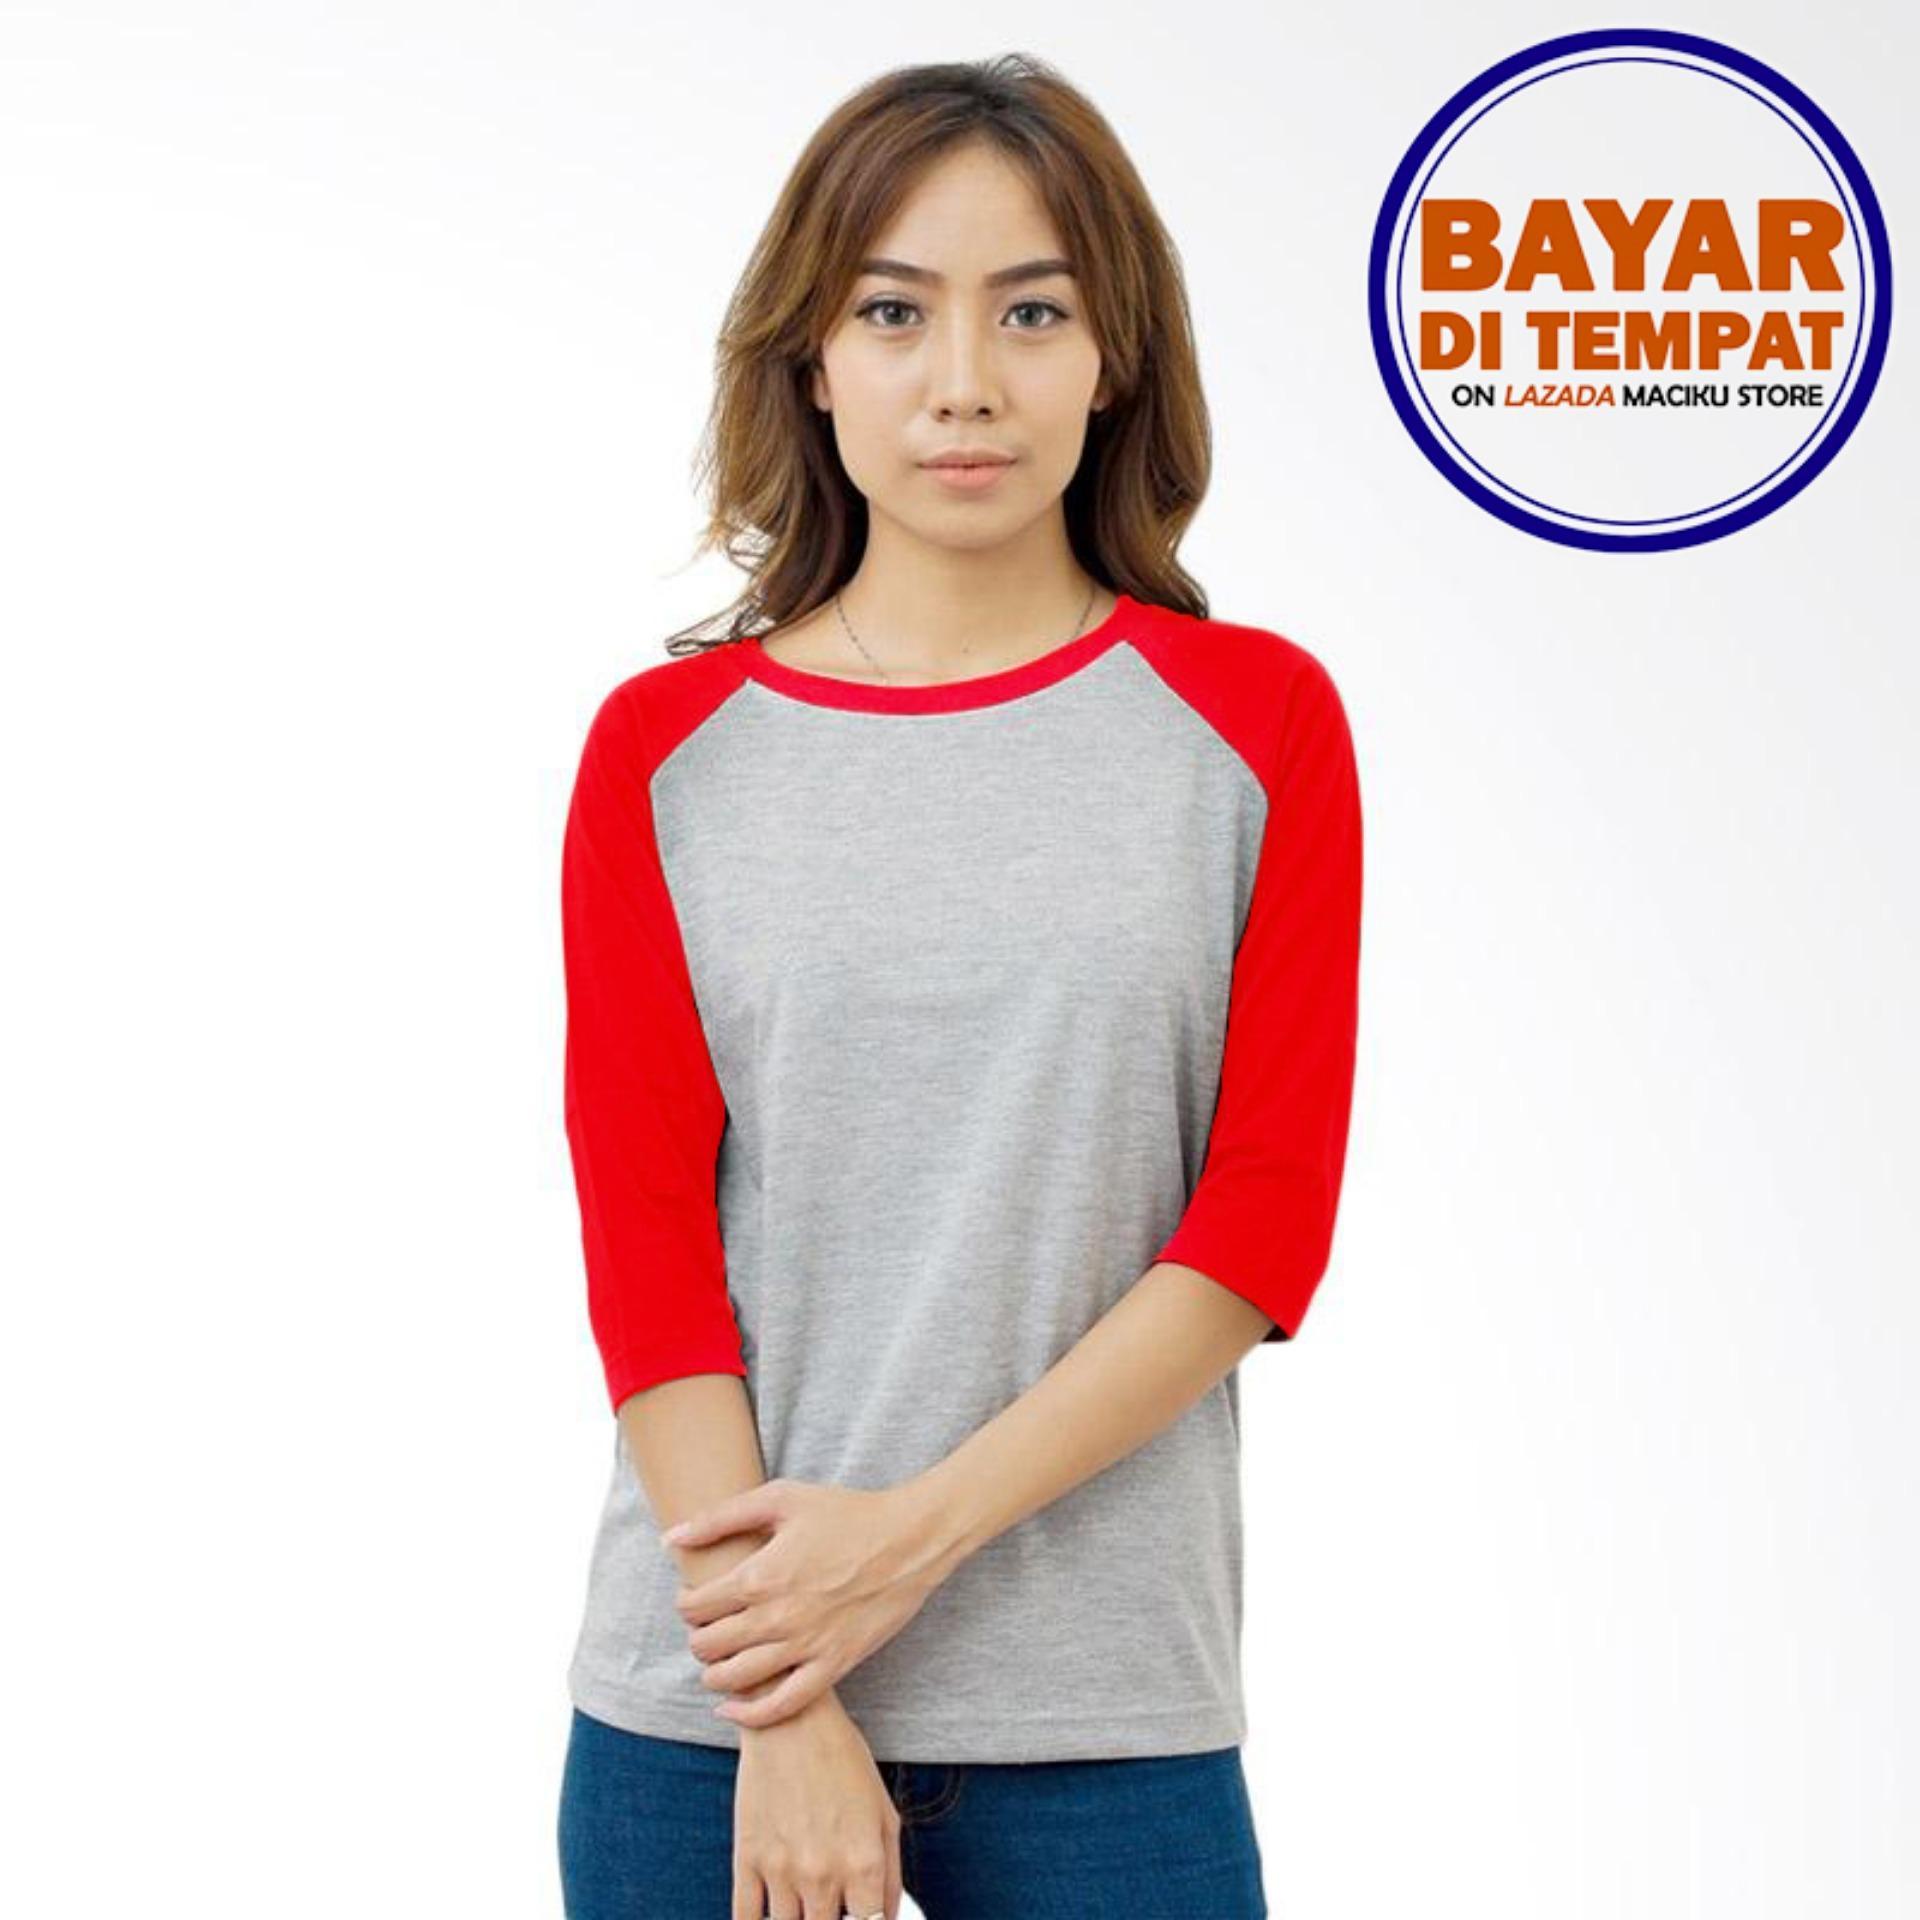 Harga Kaos T Shirt Kaos Raglan Wanita Abu Misty Kombinasi Merah Termahal